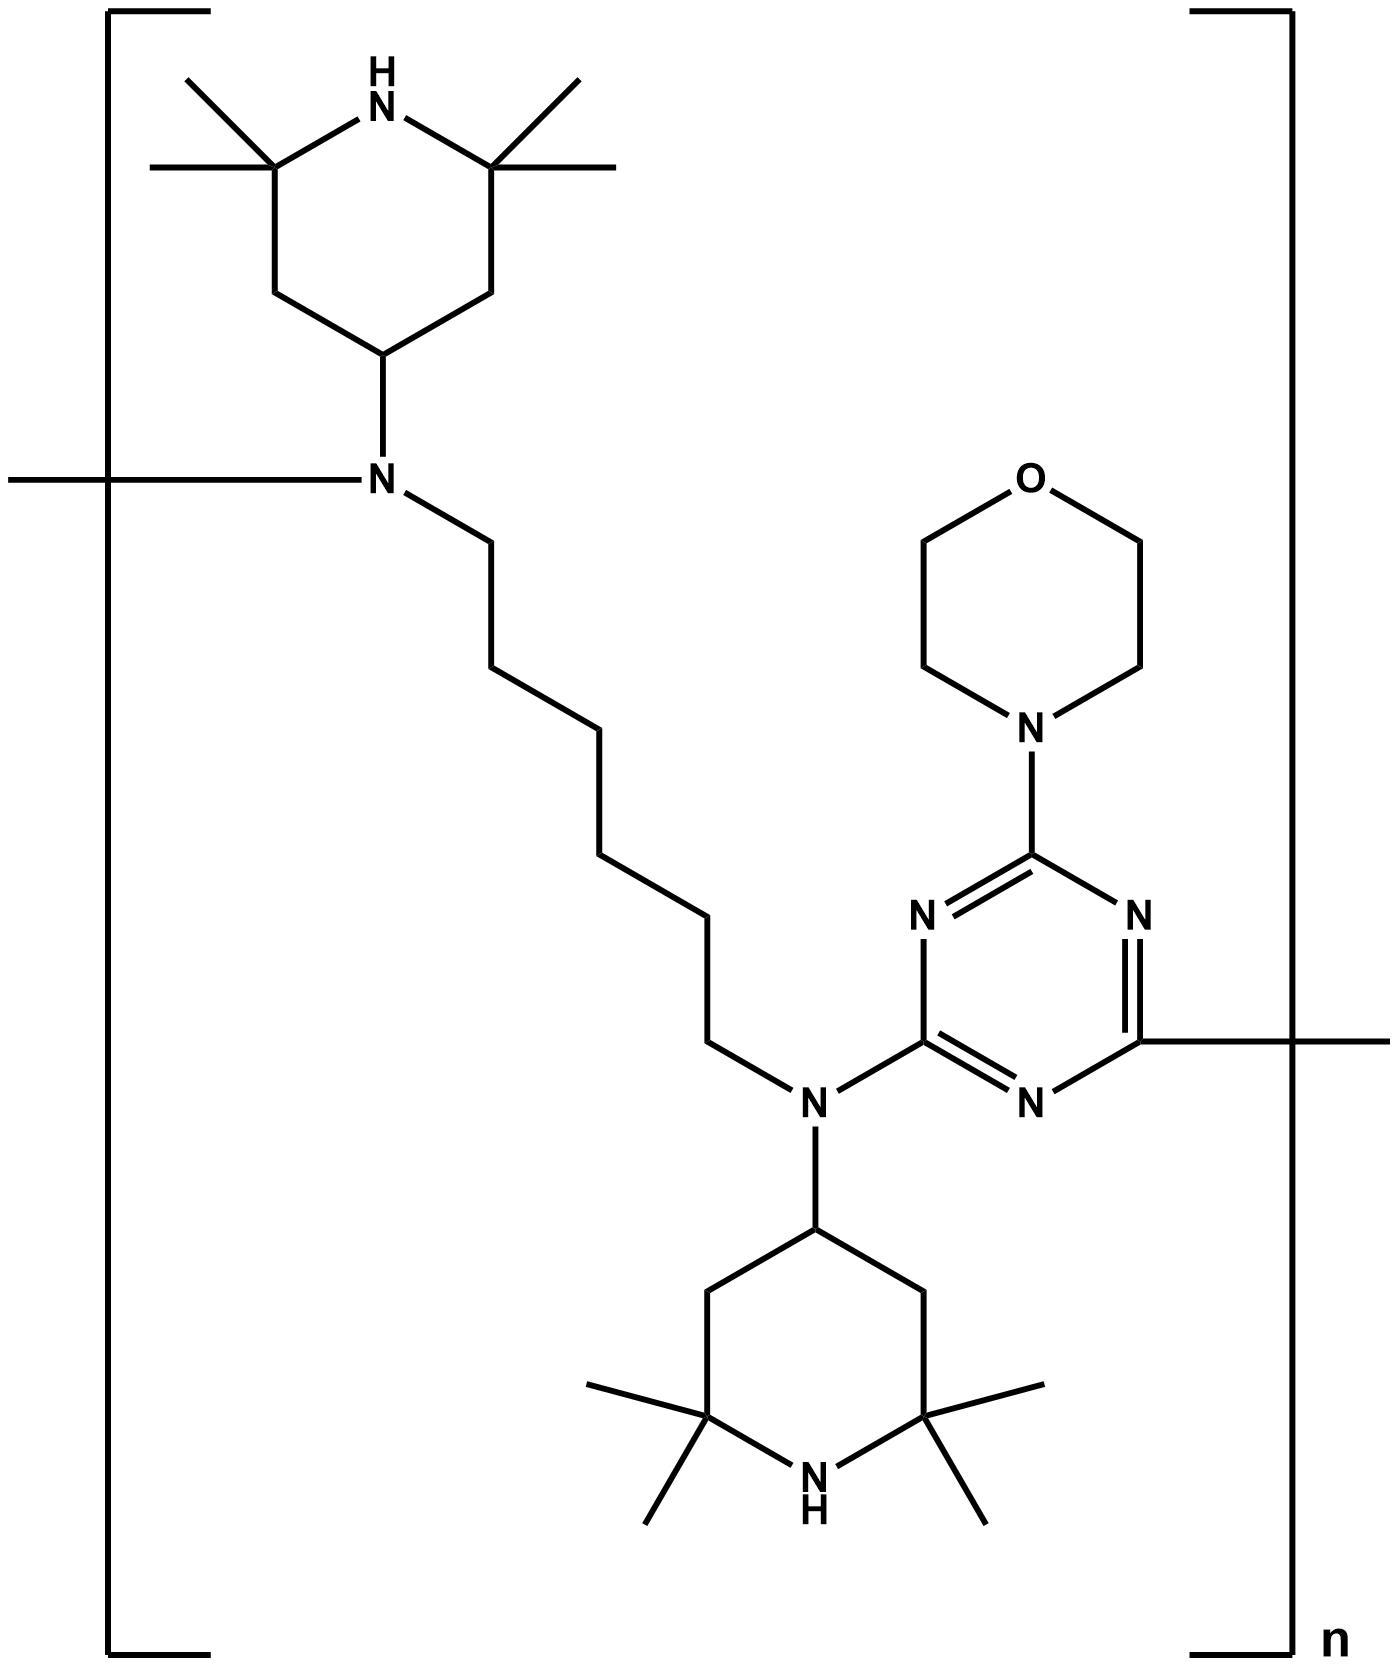 EVERSTAB 3346 - Stabilizzante UV 3346